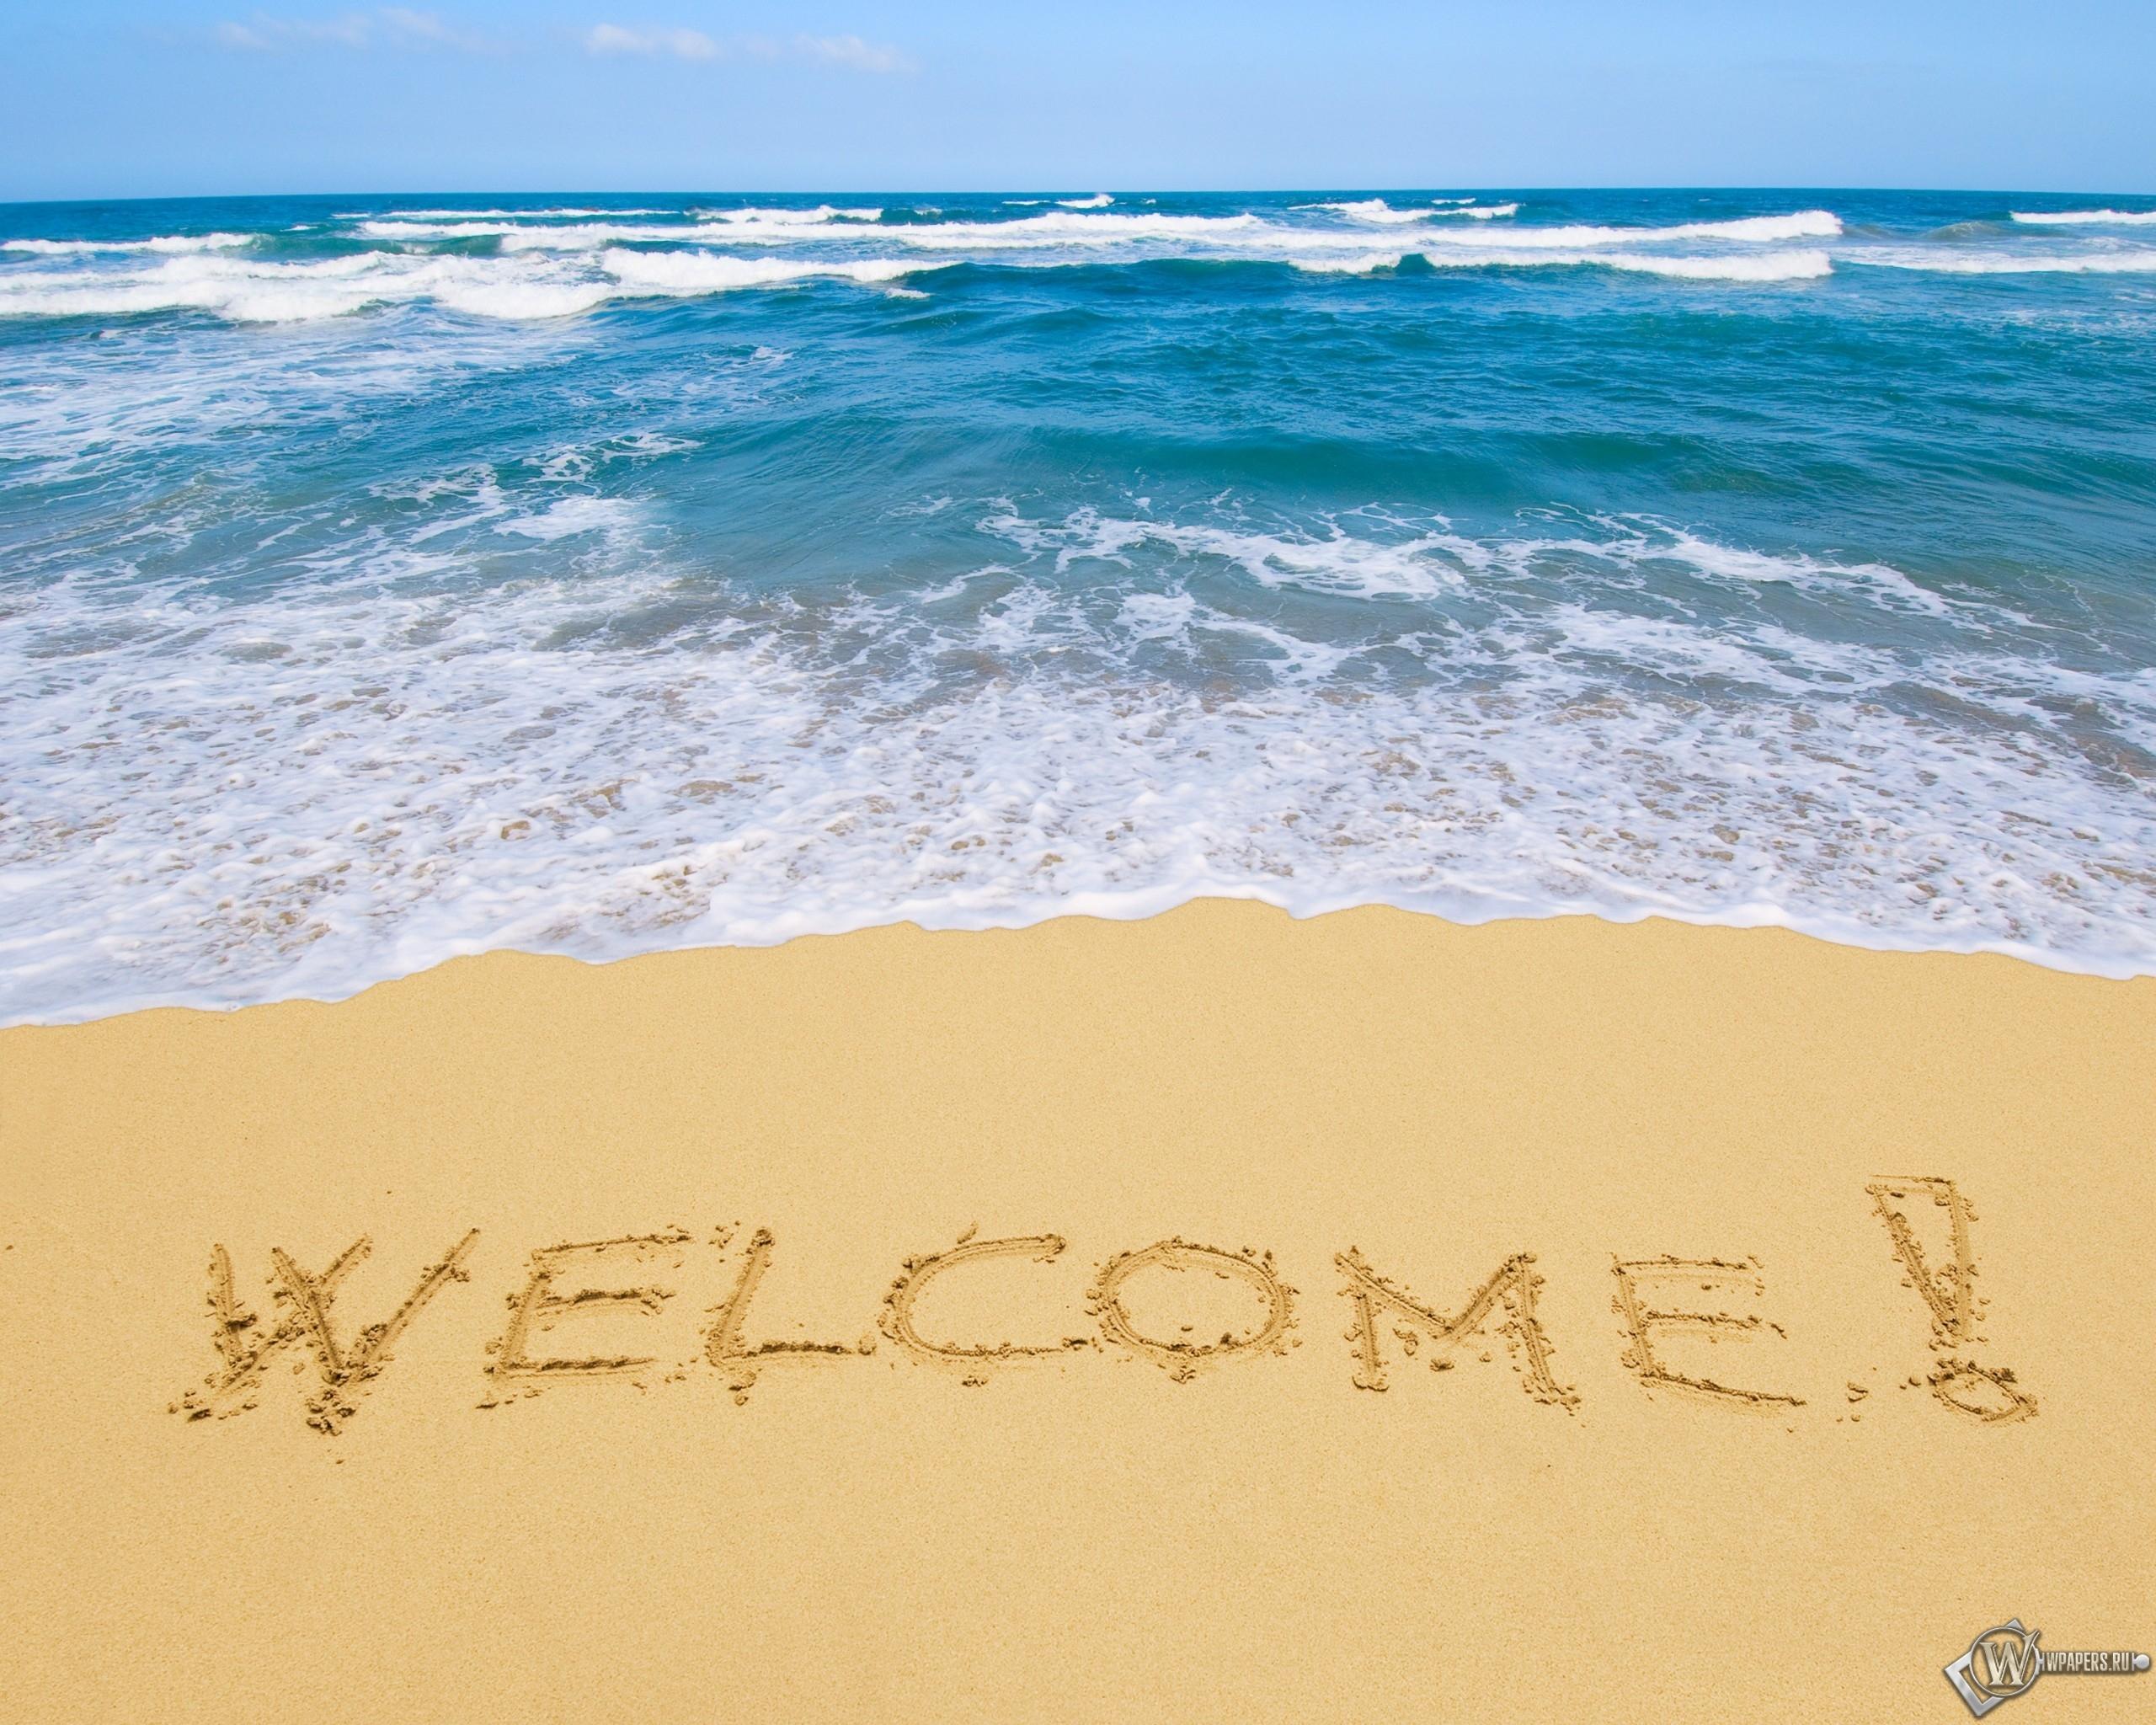 Добро пожаловать на море 2560x2048